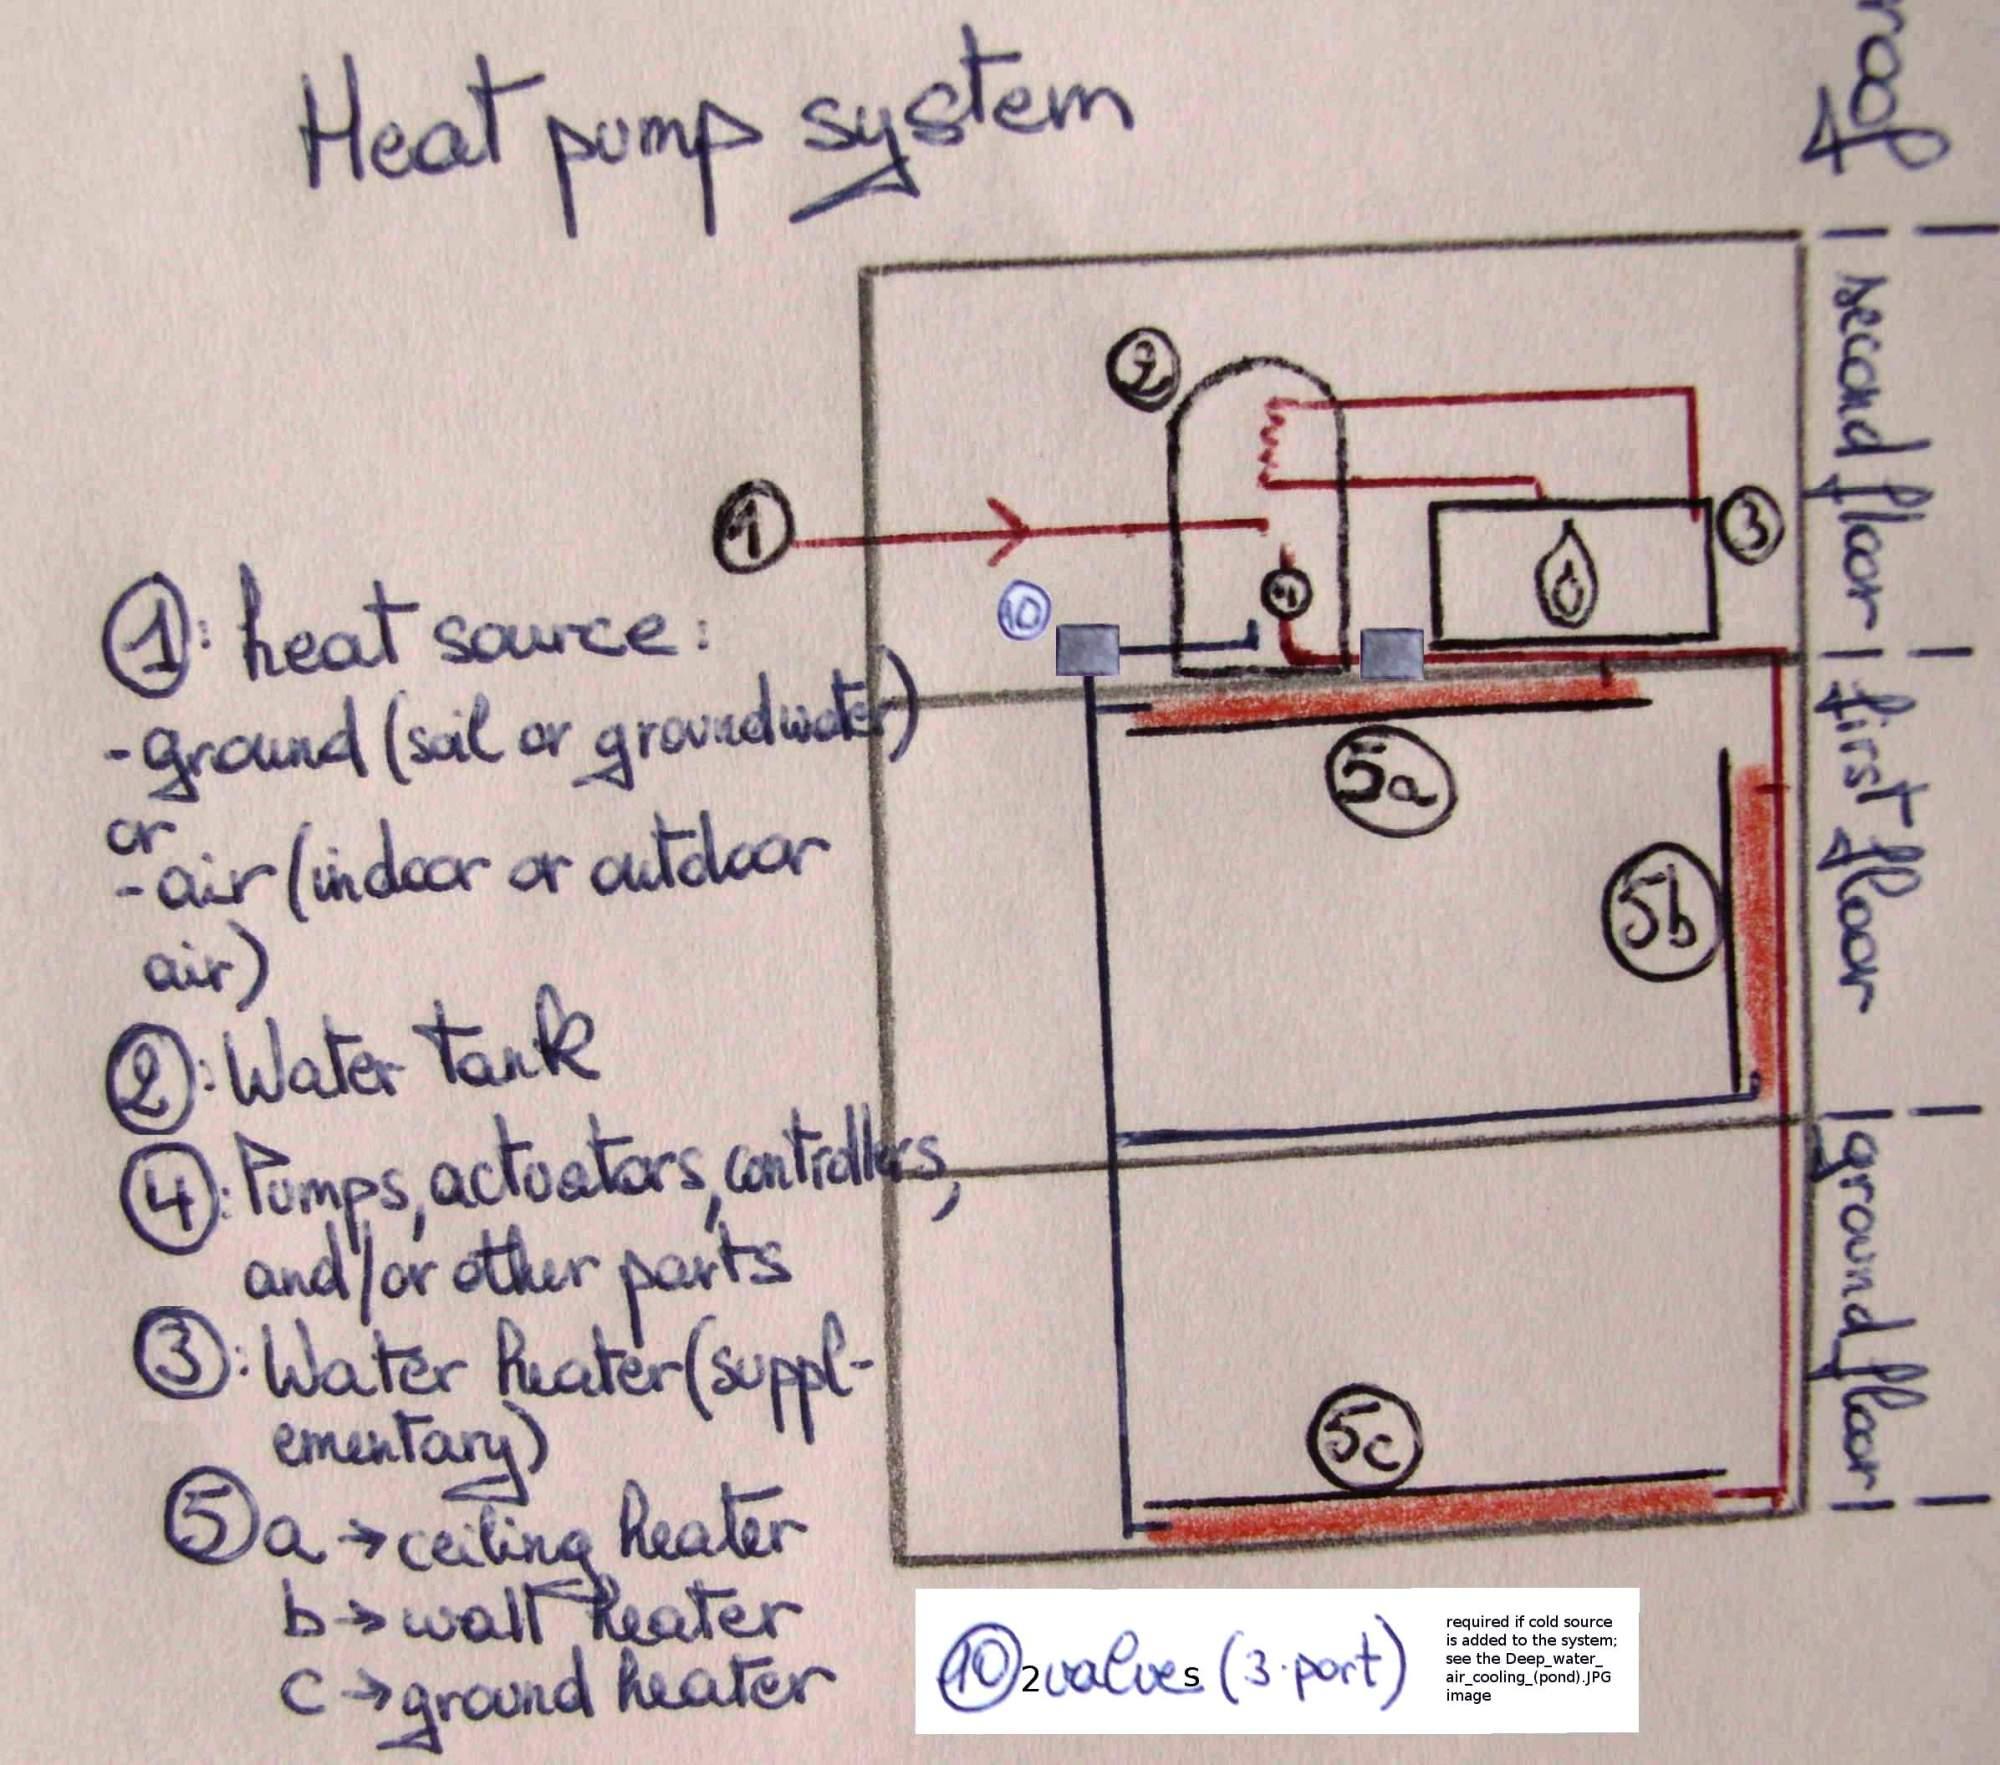 hight resolution of file heat pump system jpg